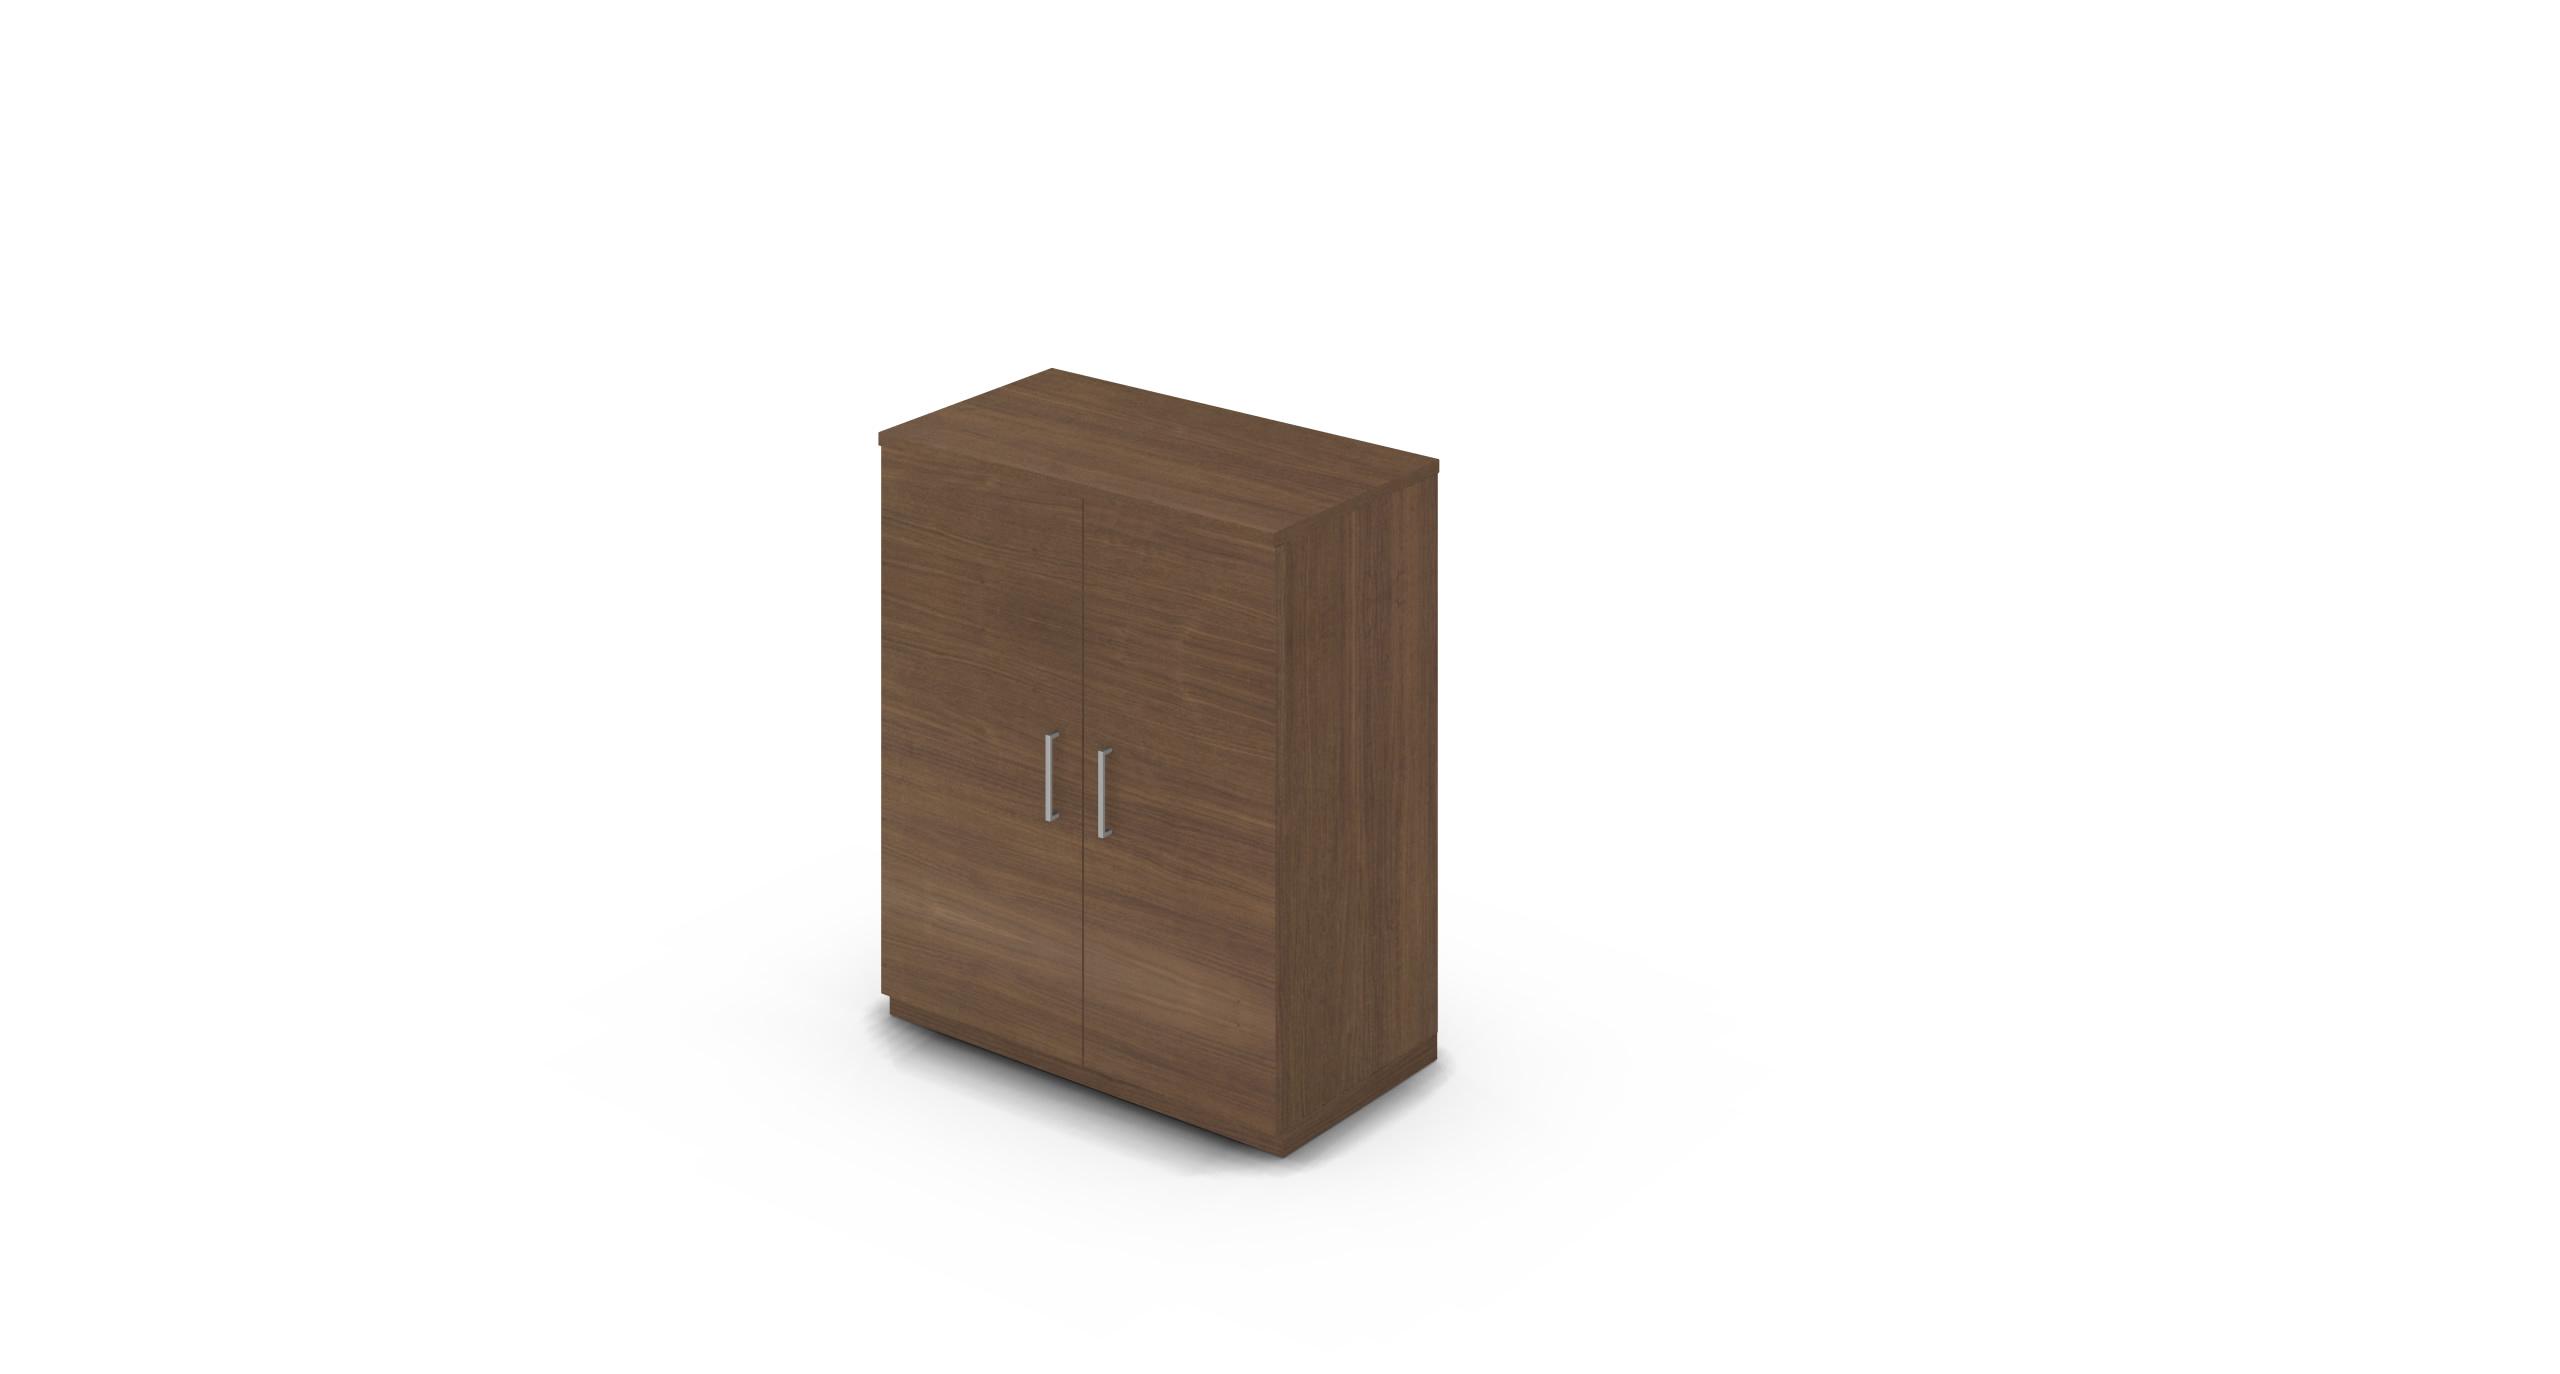 Cabinet_800x450x1125_HD_Walnut_Bar_Square_NoCylinder